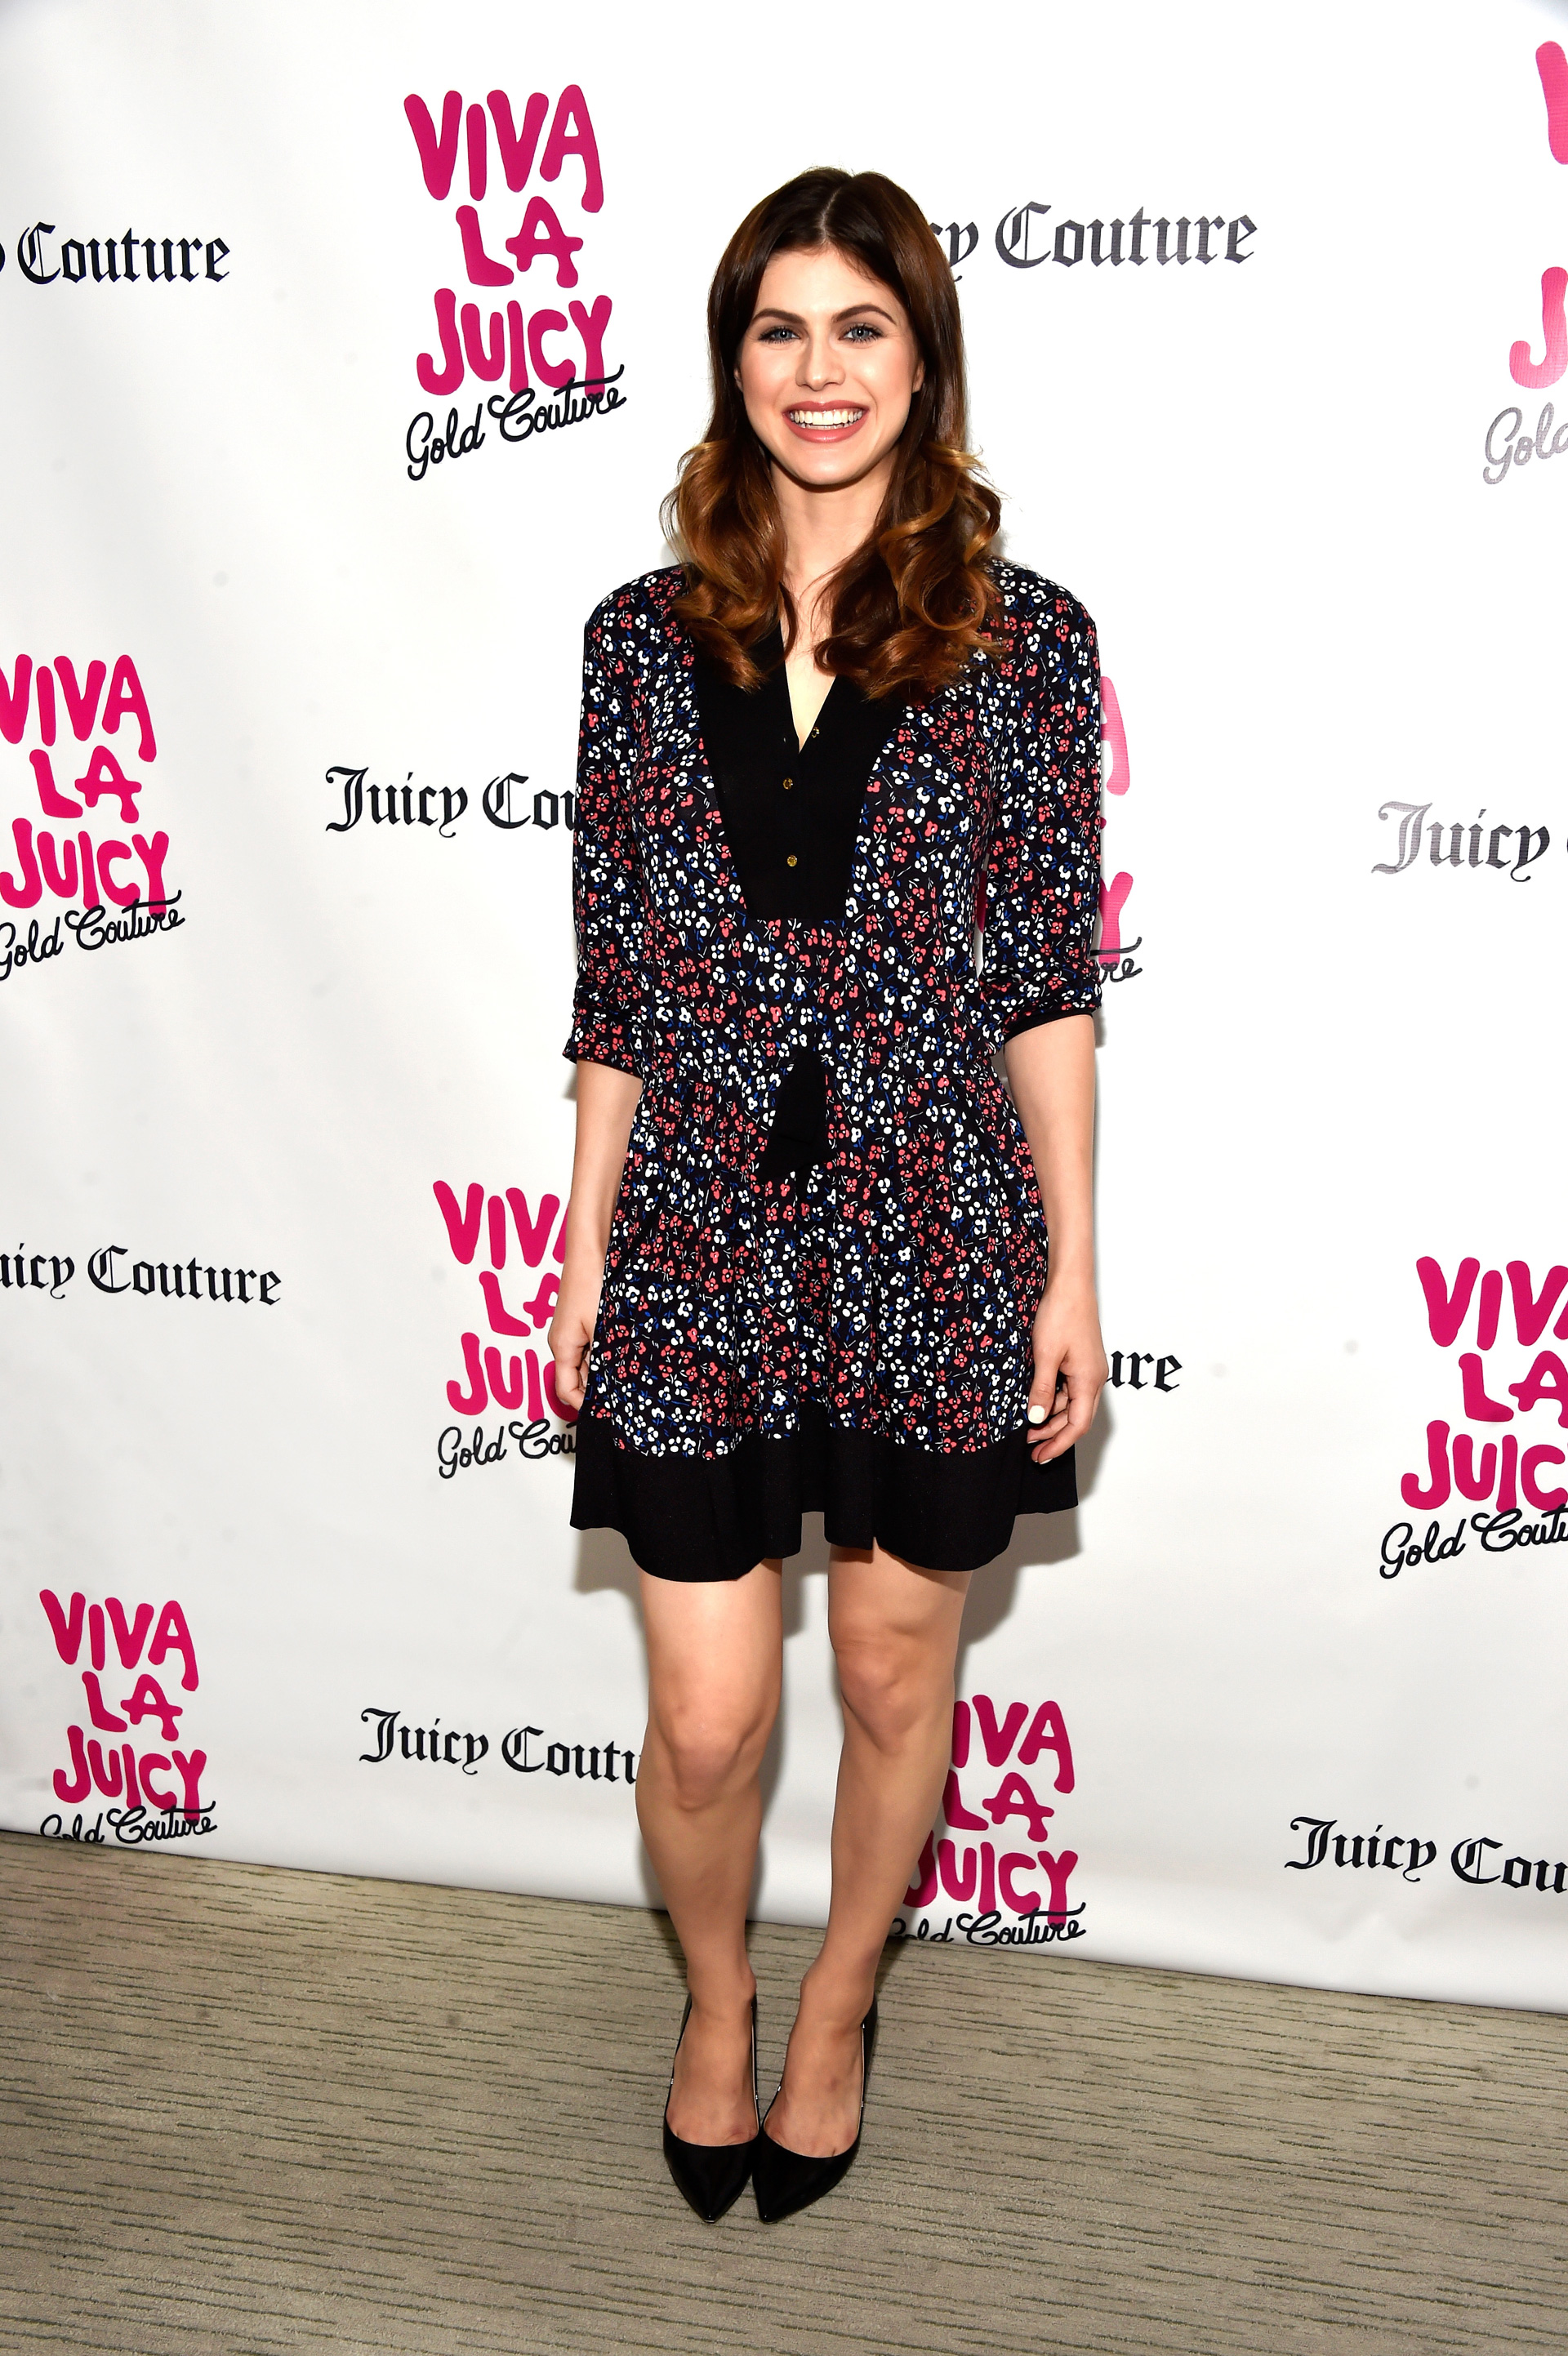 Alexandra Daddario at the Viva La Juicy Gold Couture fragrance launch